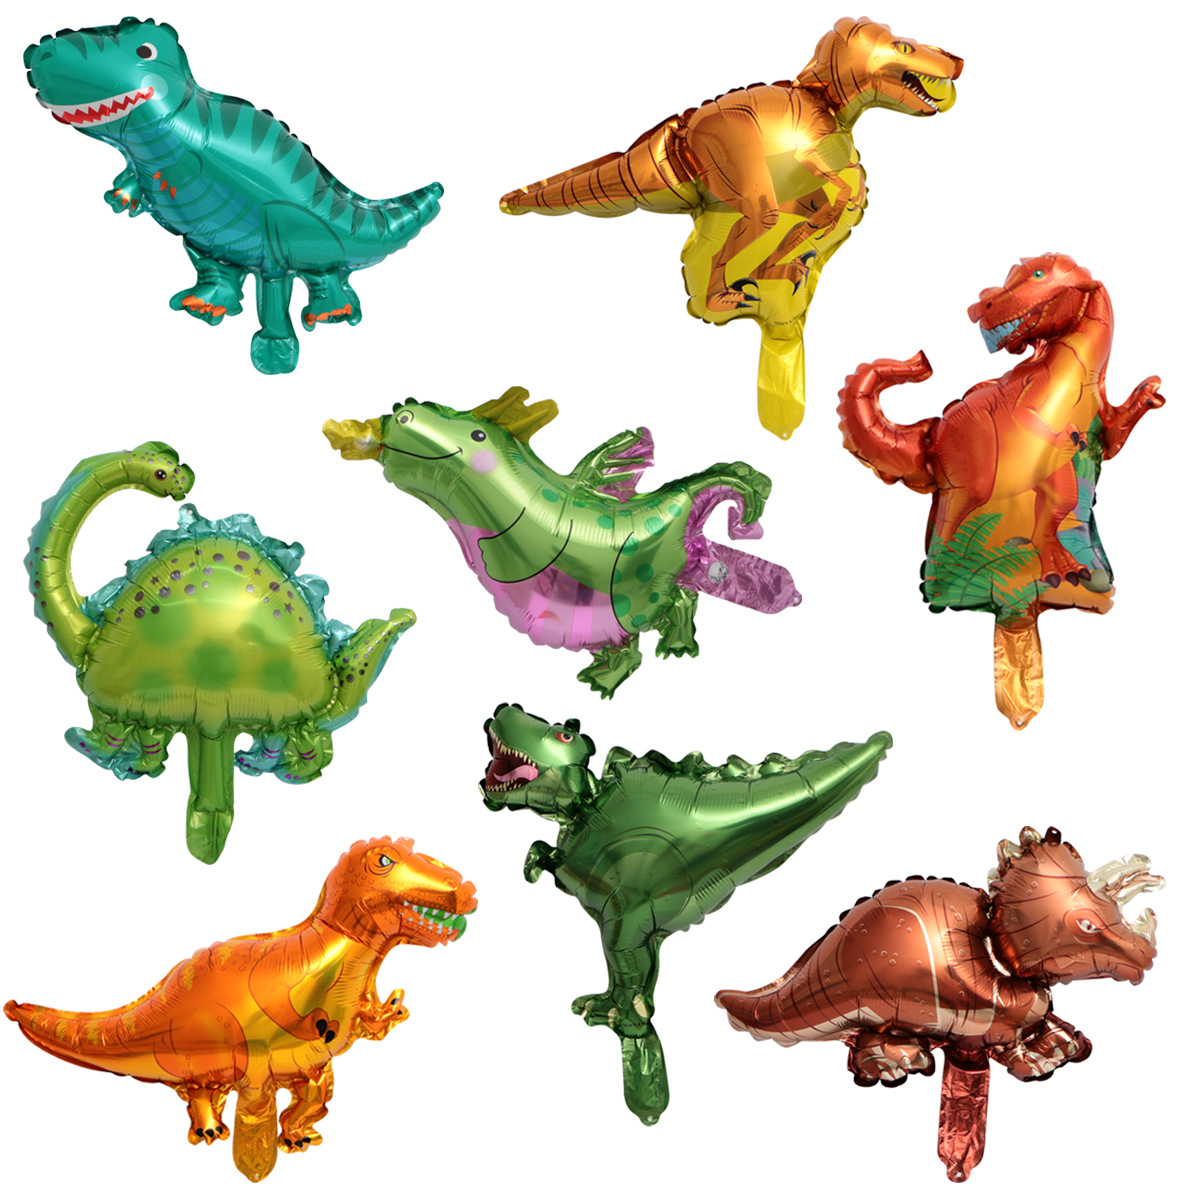 3pcs Mini Size Cartoon Dinosaur Foil Balloons Animal Helium Balloon Children Toy Boys Favor Kids Birthday Party Decoration Gift figurine